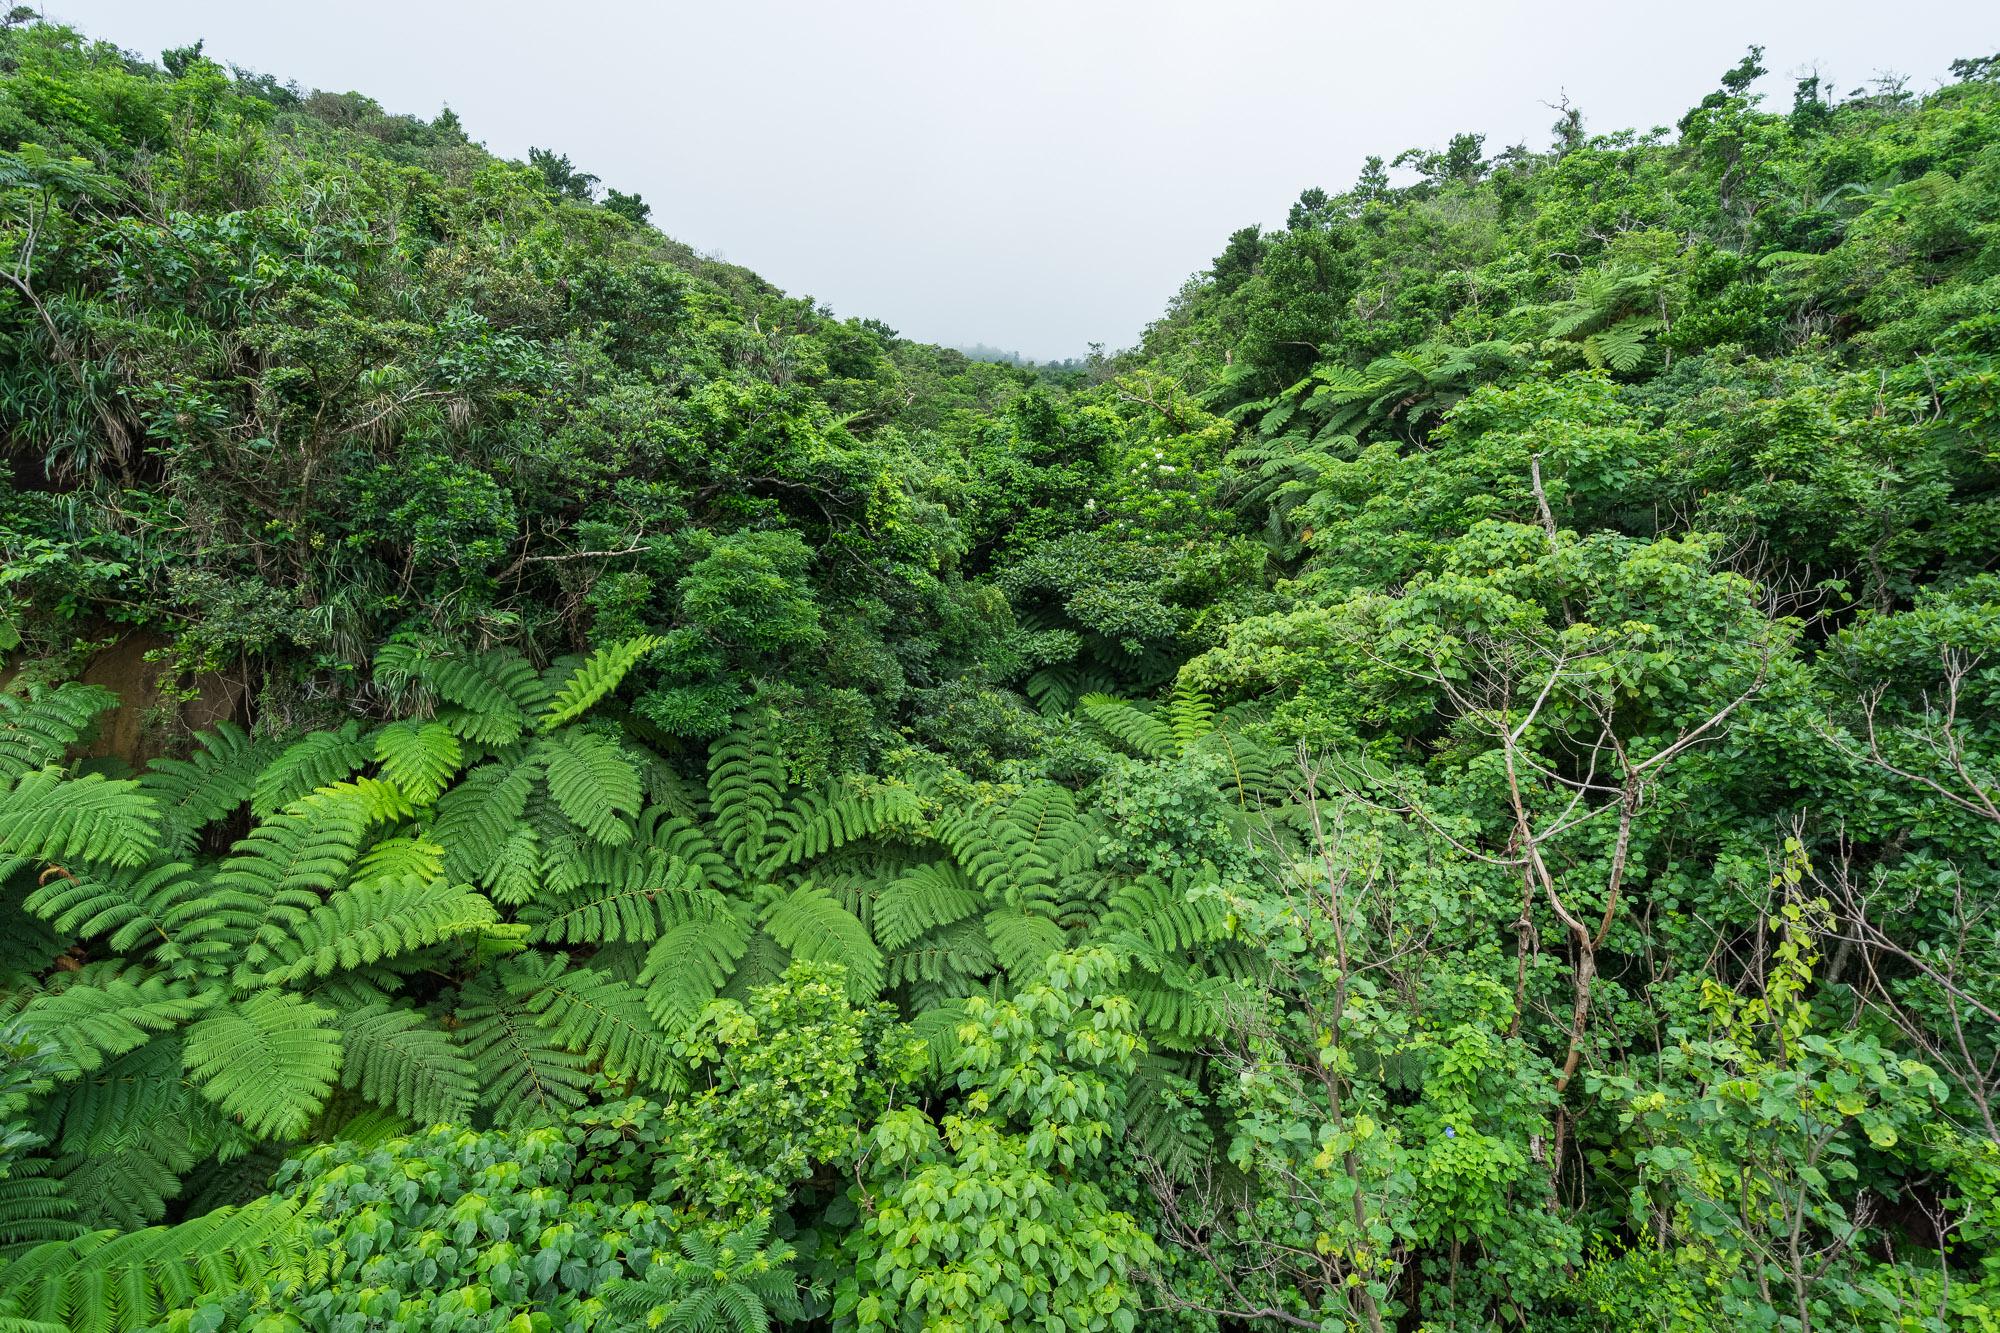 Lush Jungle Scenery